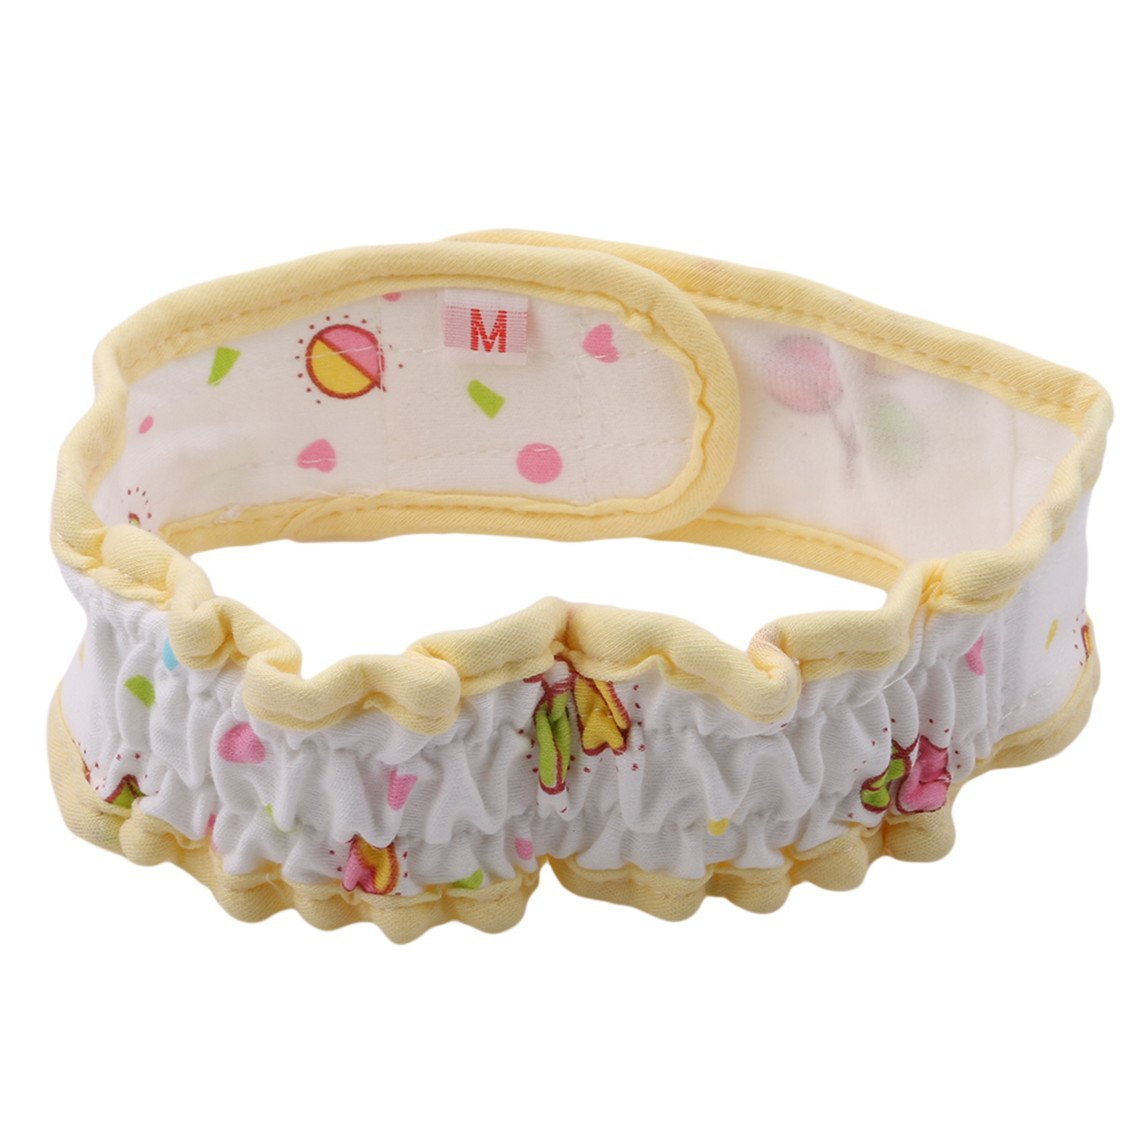 Rurah Baby Diaper Belt Fixed Belt Buckle Elastic Diapers Simple Diaper Buckle Diaper Kids Fixed Belt,yellow,L